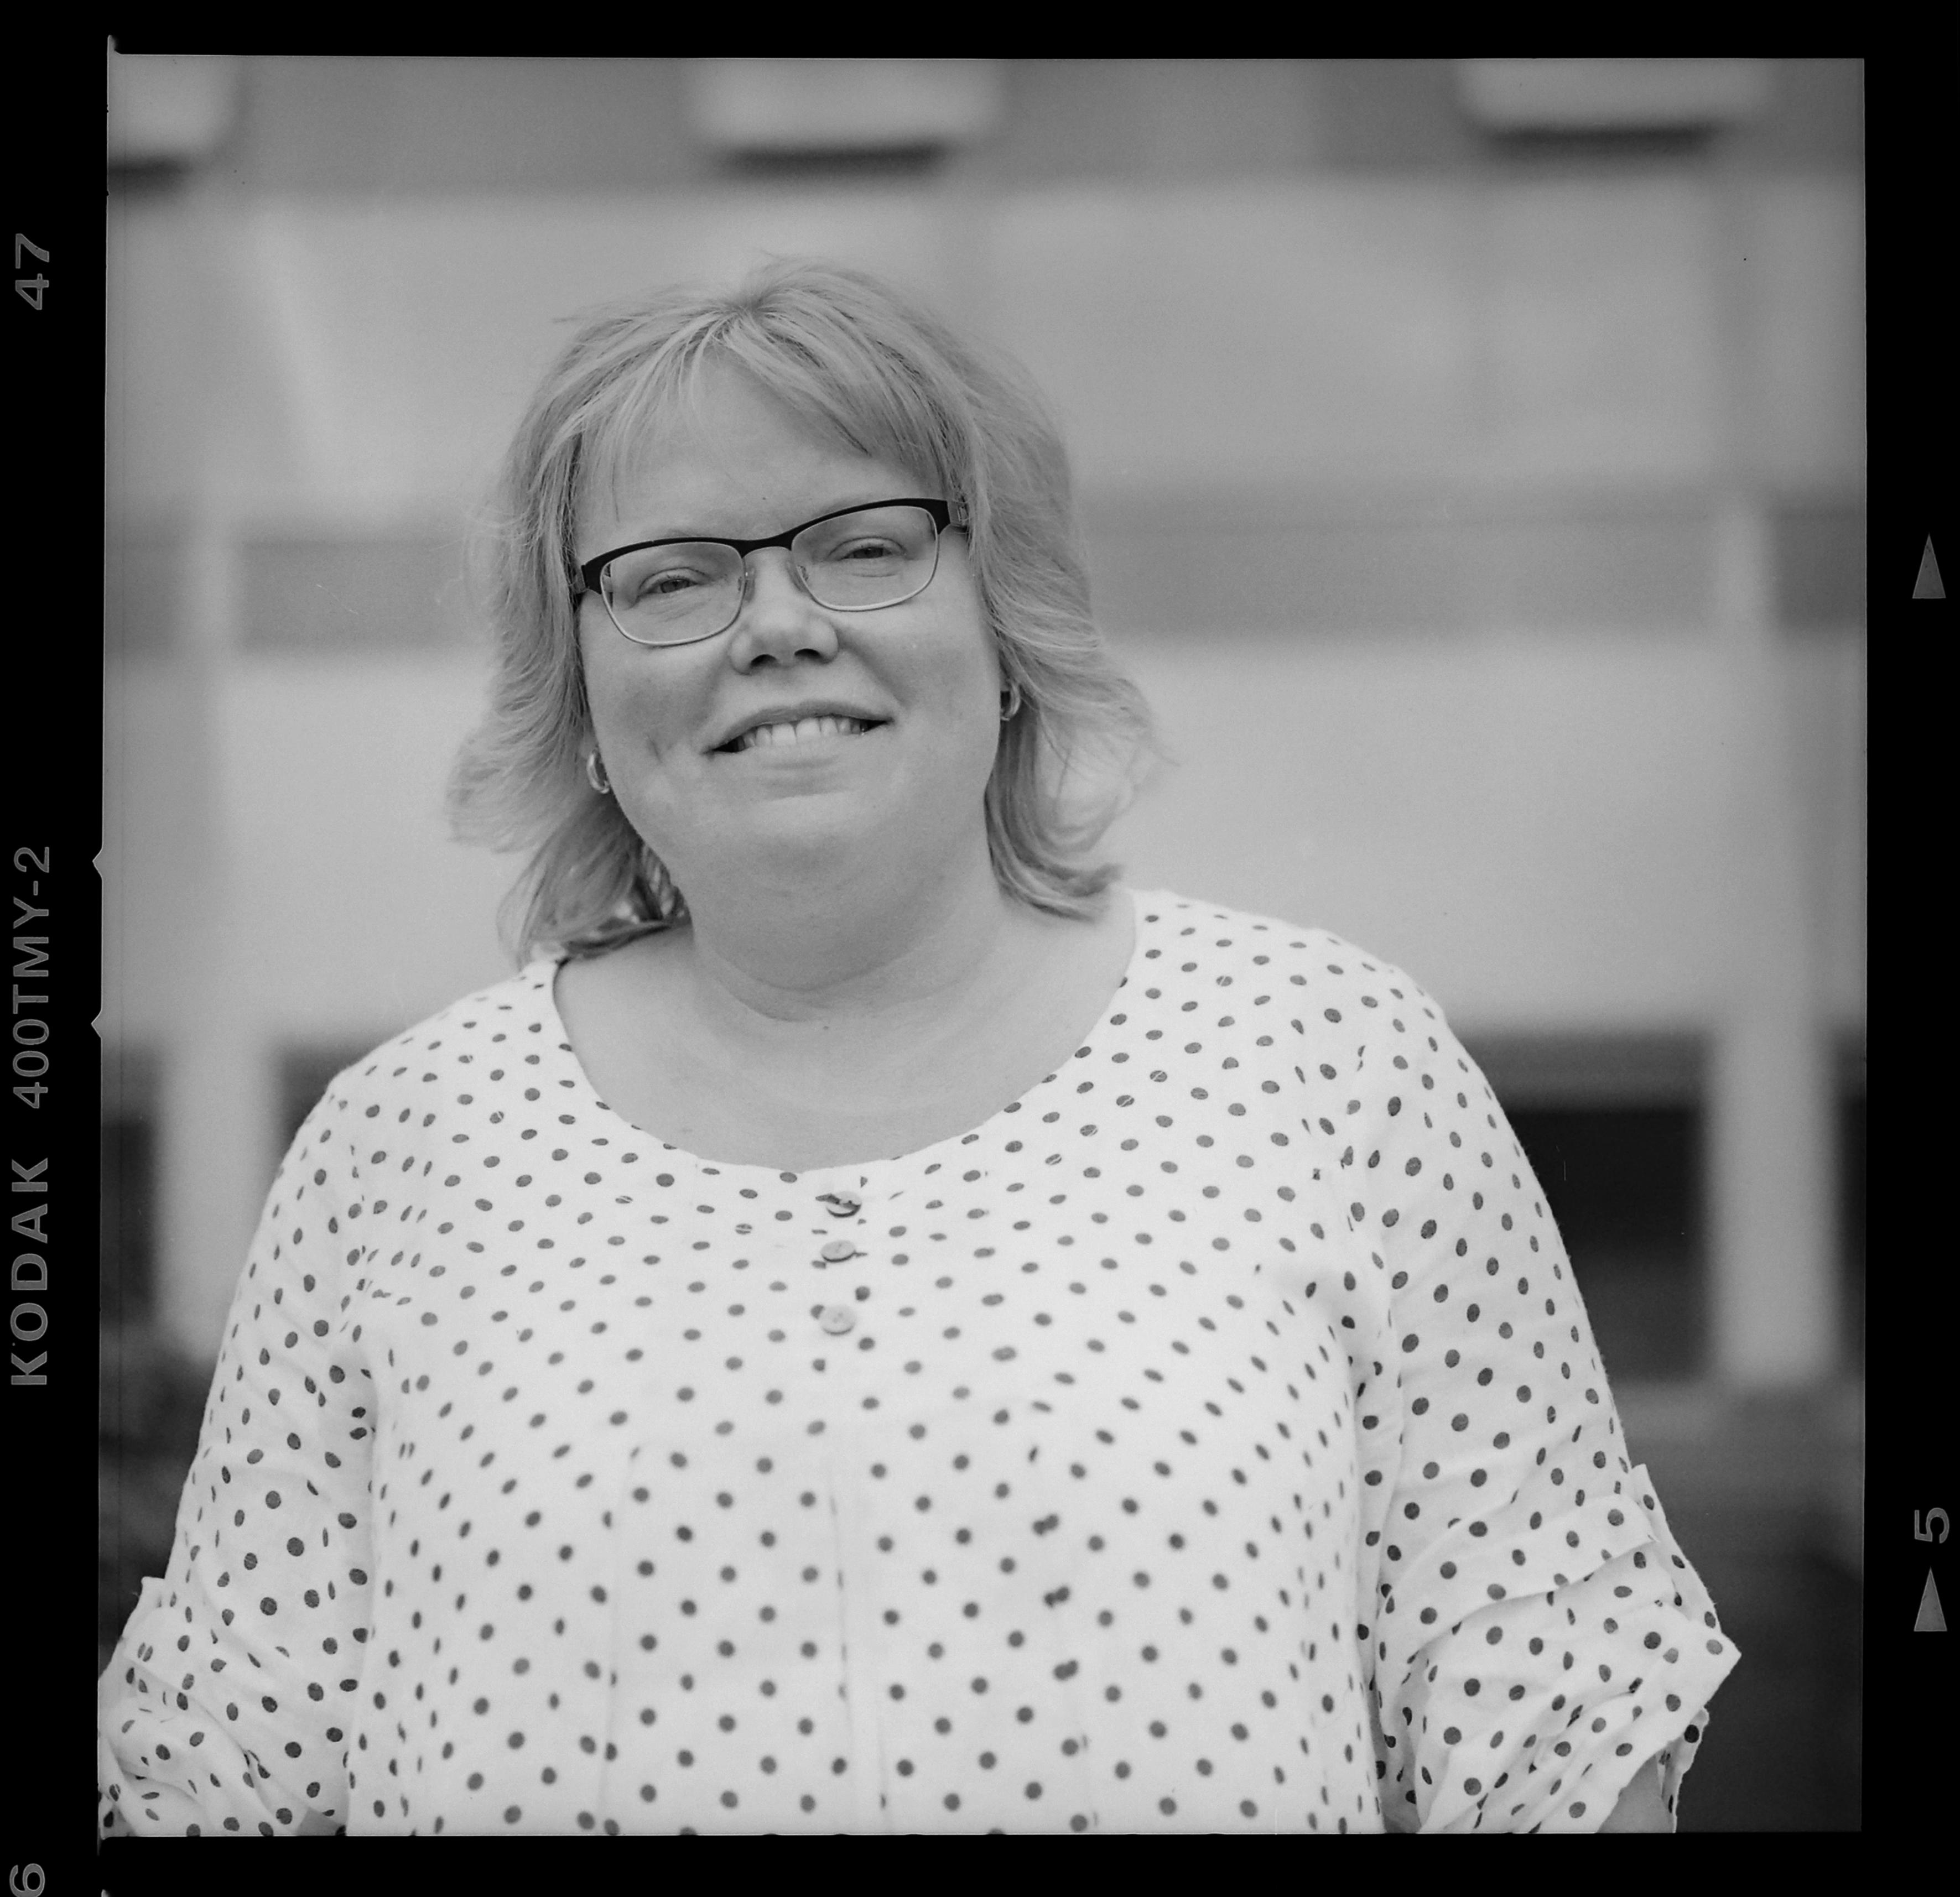 Åsa Kratz, ordförande i Länsteatrarna i Sverige. Foto: Mikael Andersson, 2016-06-03, Hasselblad 500 cm, 150mm, f4-1/500 sek.